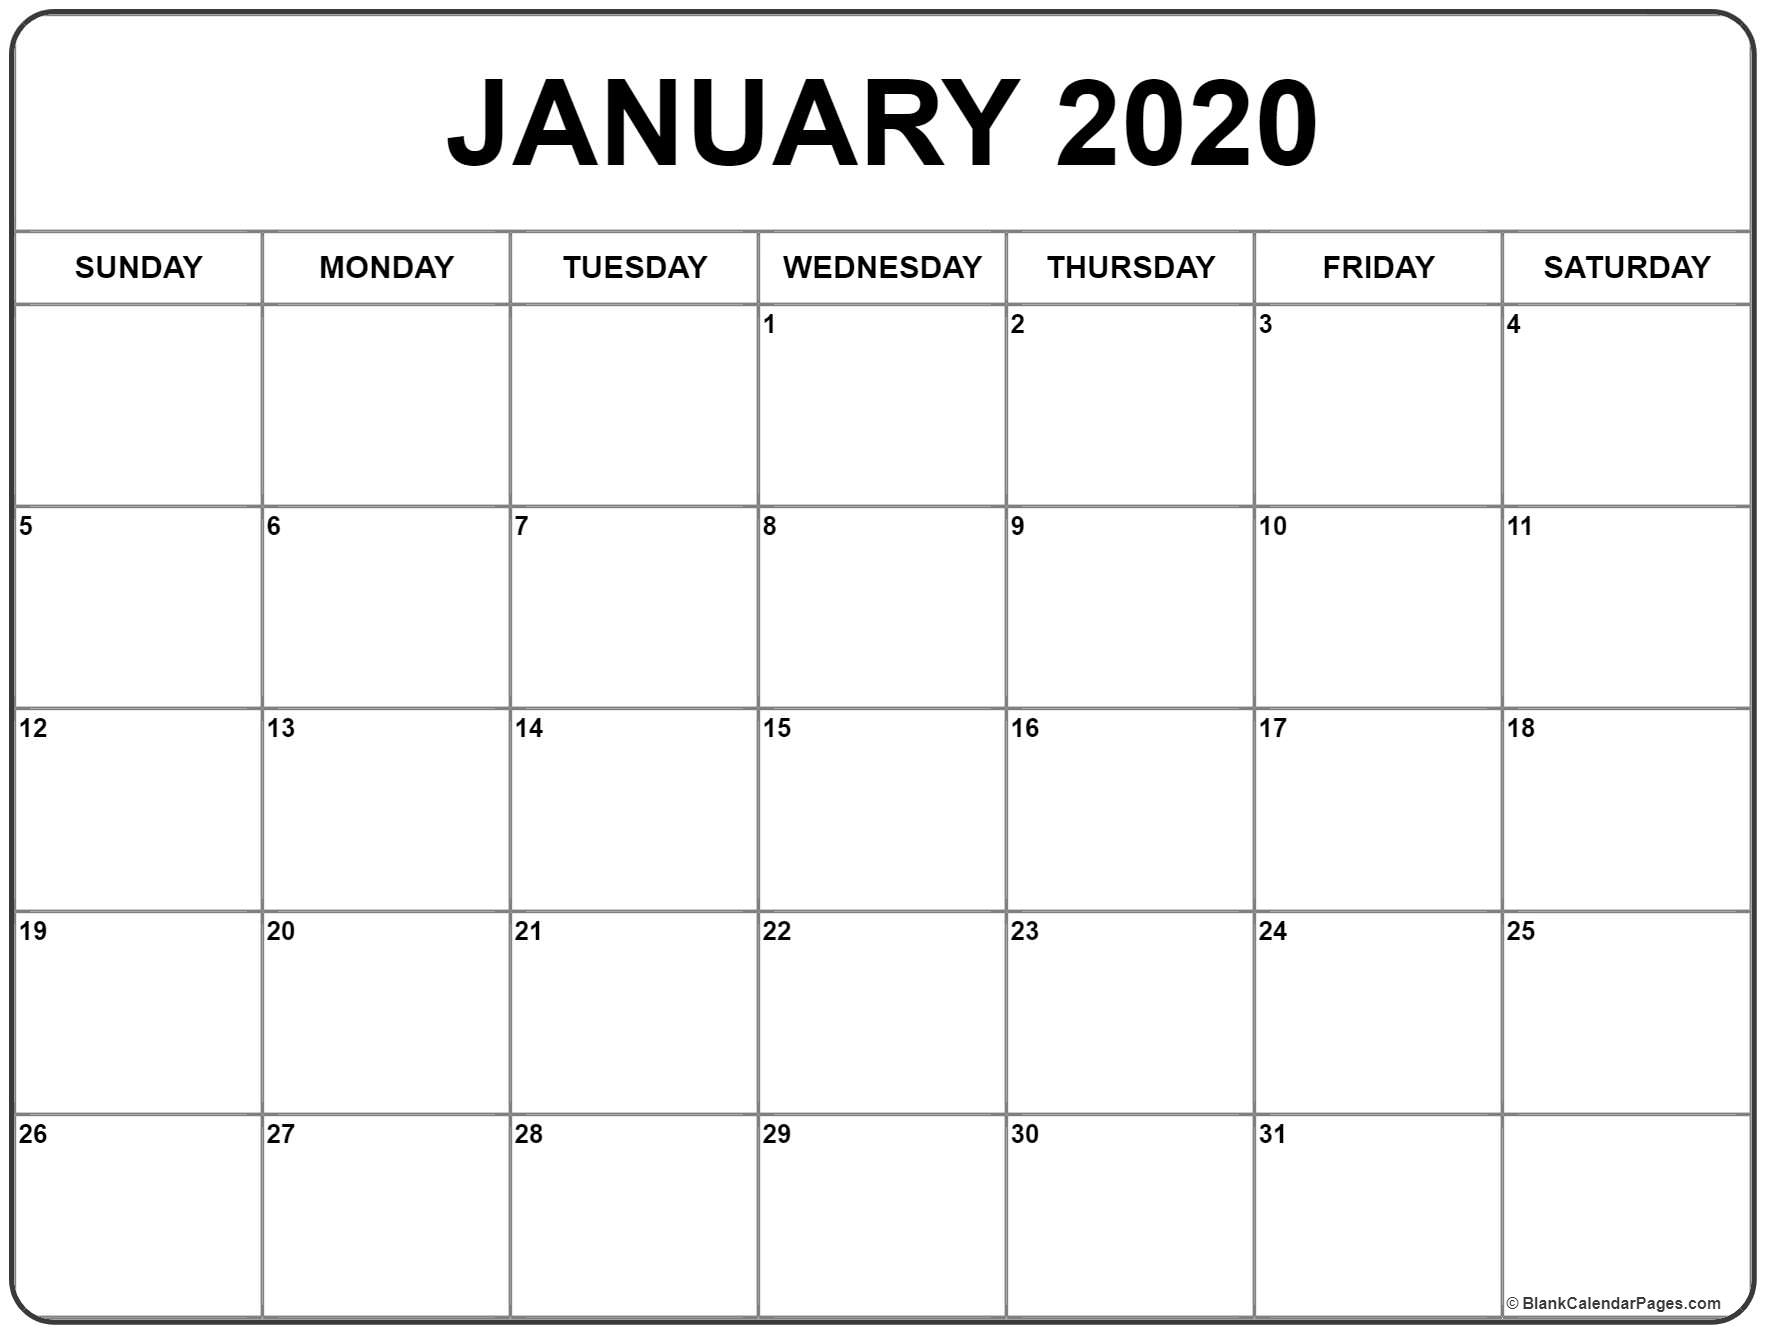 January 2020 Calendar | Free Printable Monthly Calendars Calendar Template 2020 Printable Free Black And White